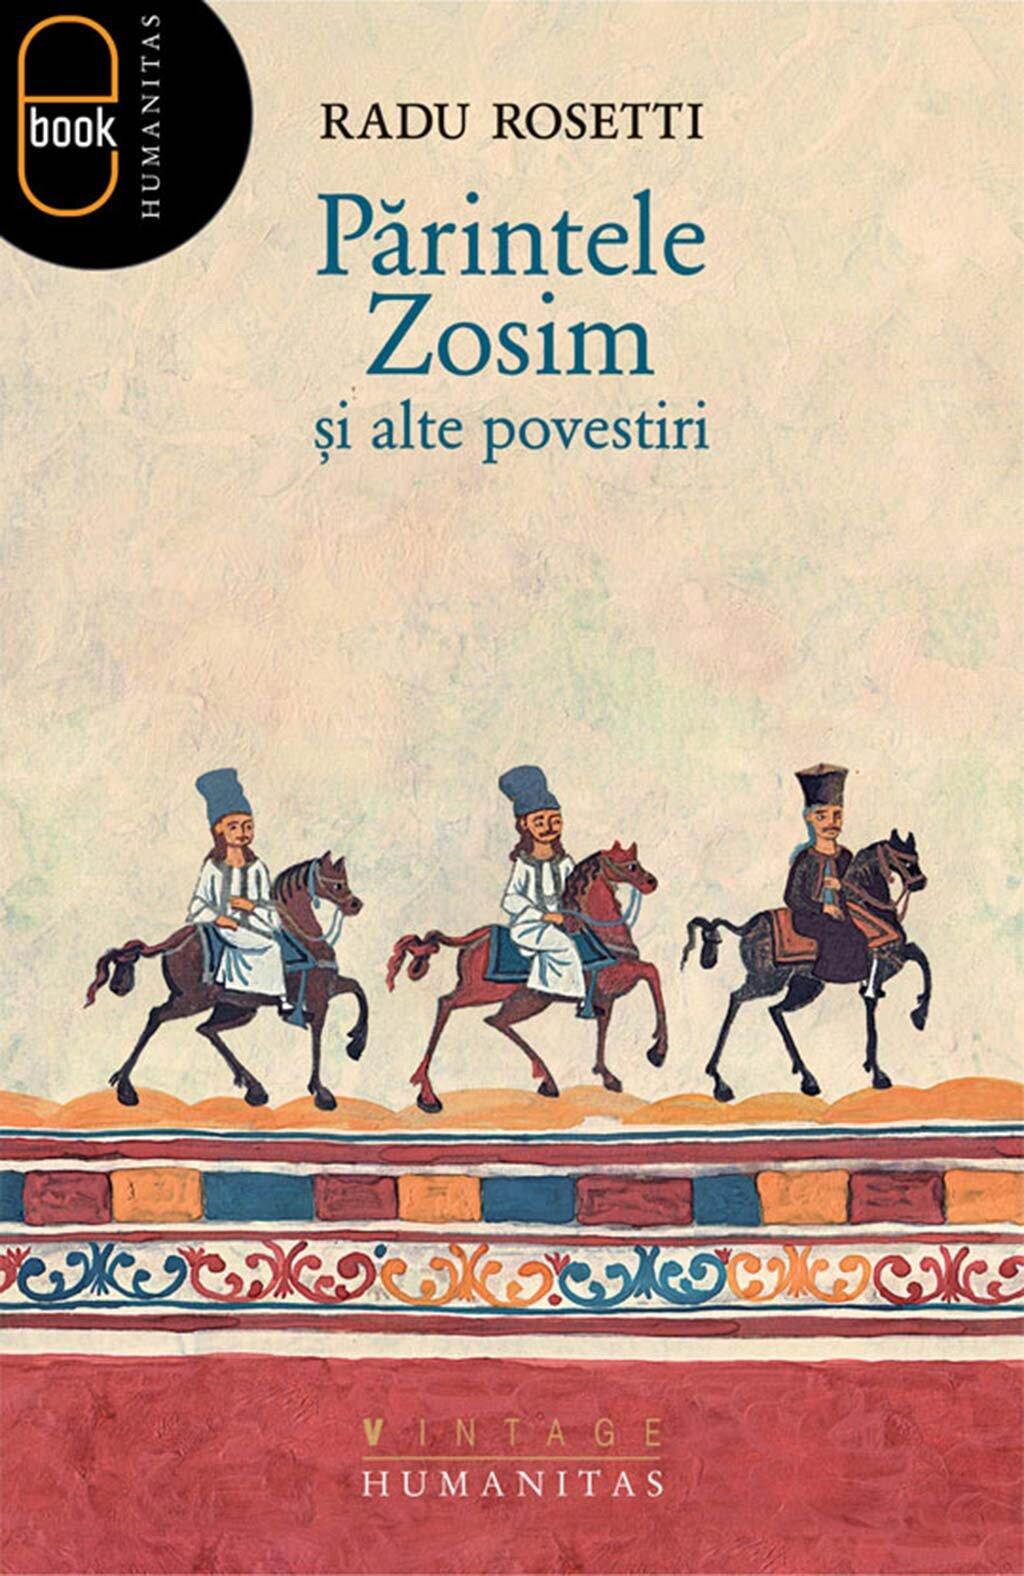 Parintele Zosim si alte povestiri (eBook)